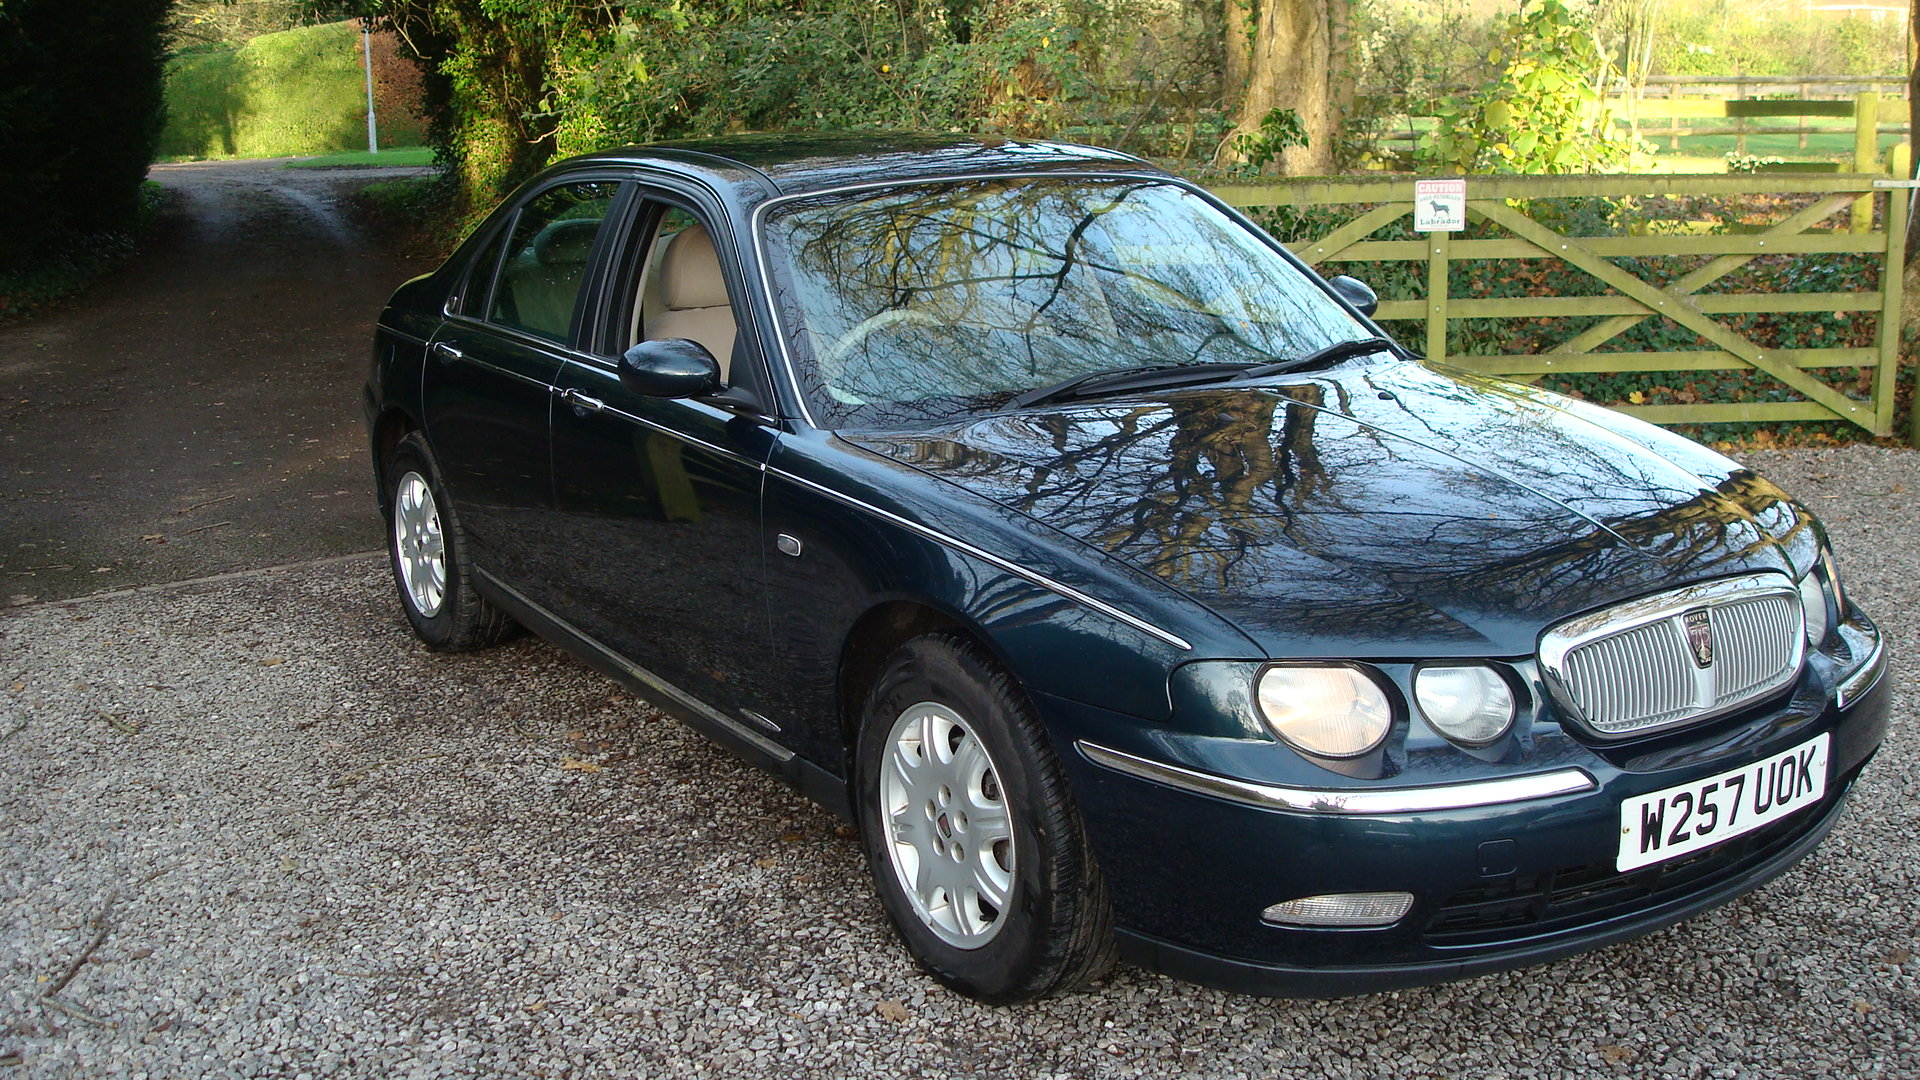 Club Car Parts >> Rover 75 2.0 V6 Club - Country Classics : Country Classics